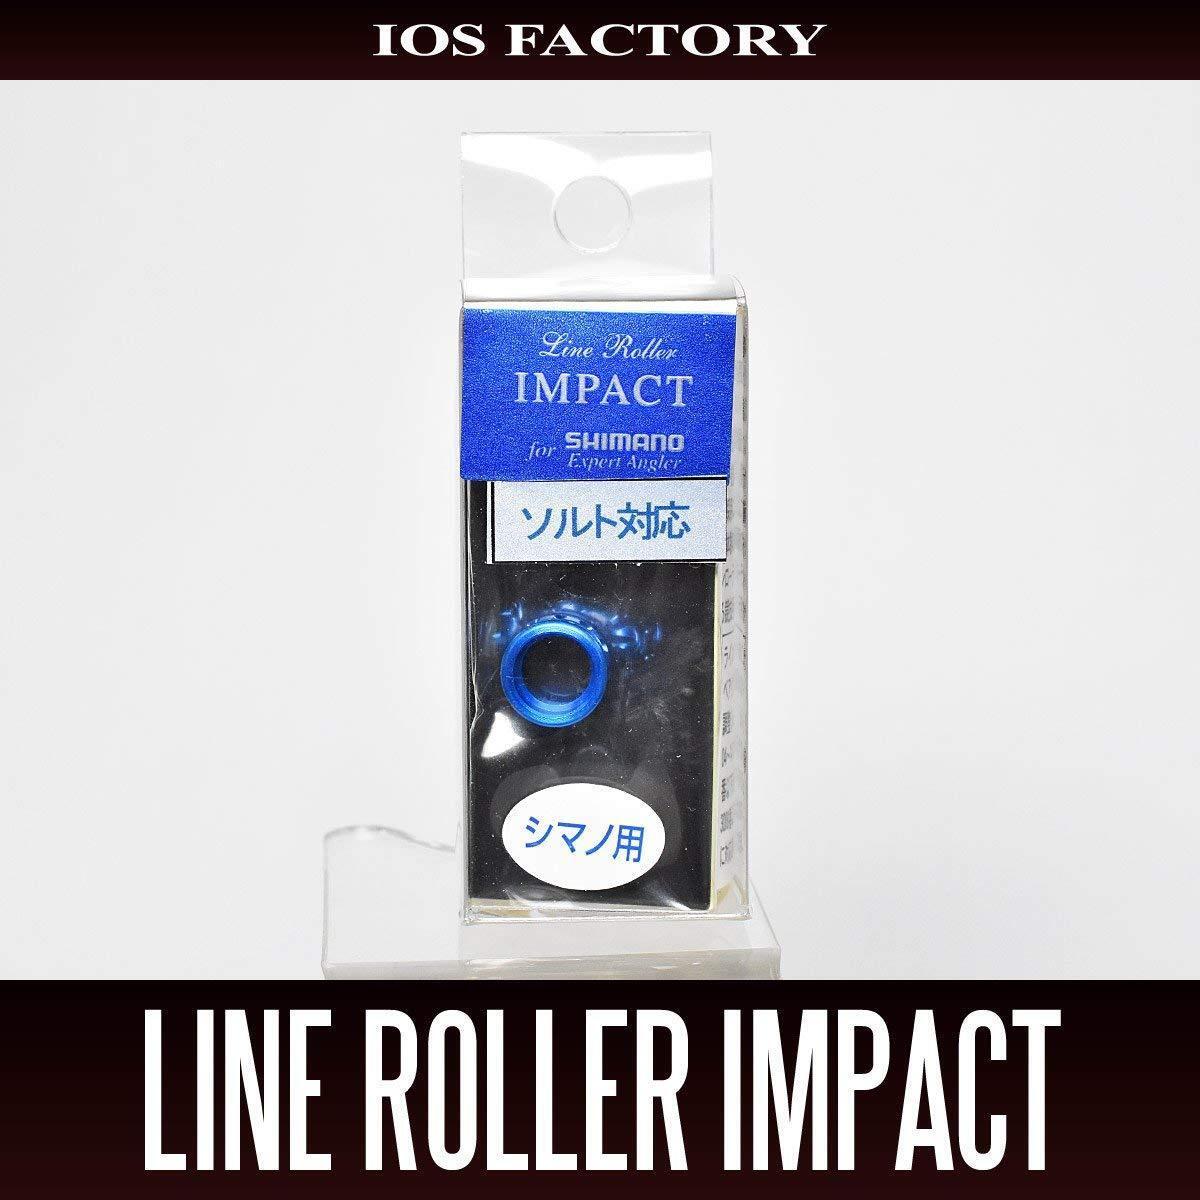 Rodillo de línea de fábrica de IOS impacto para Shimano Azul